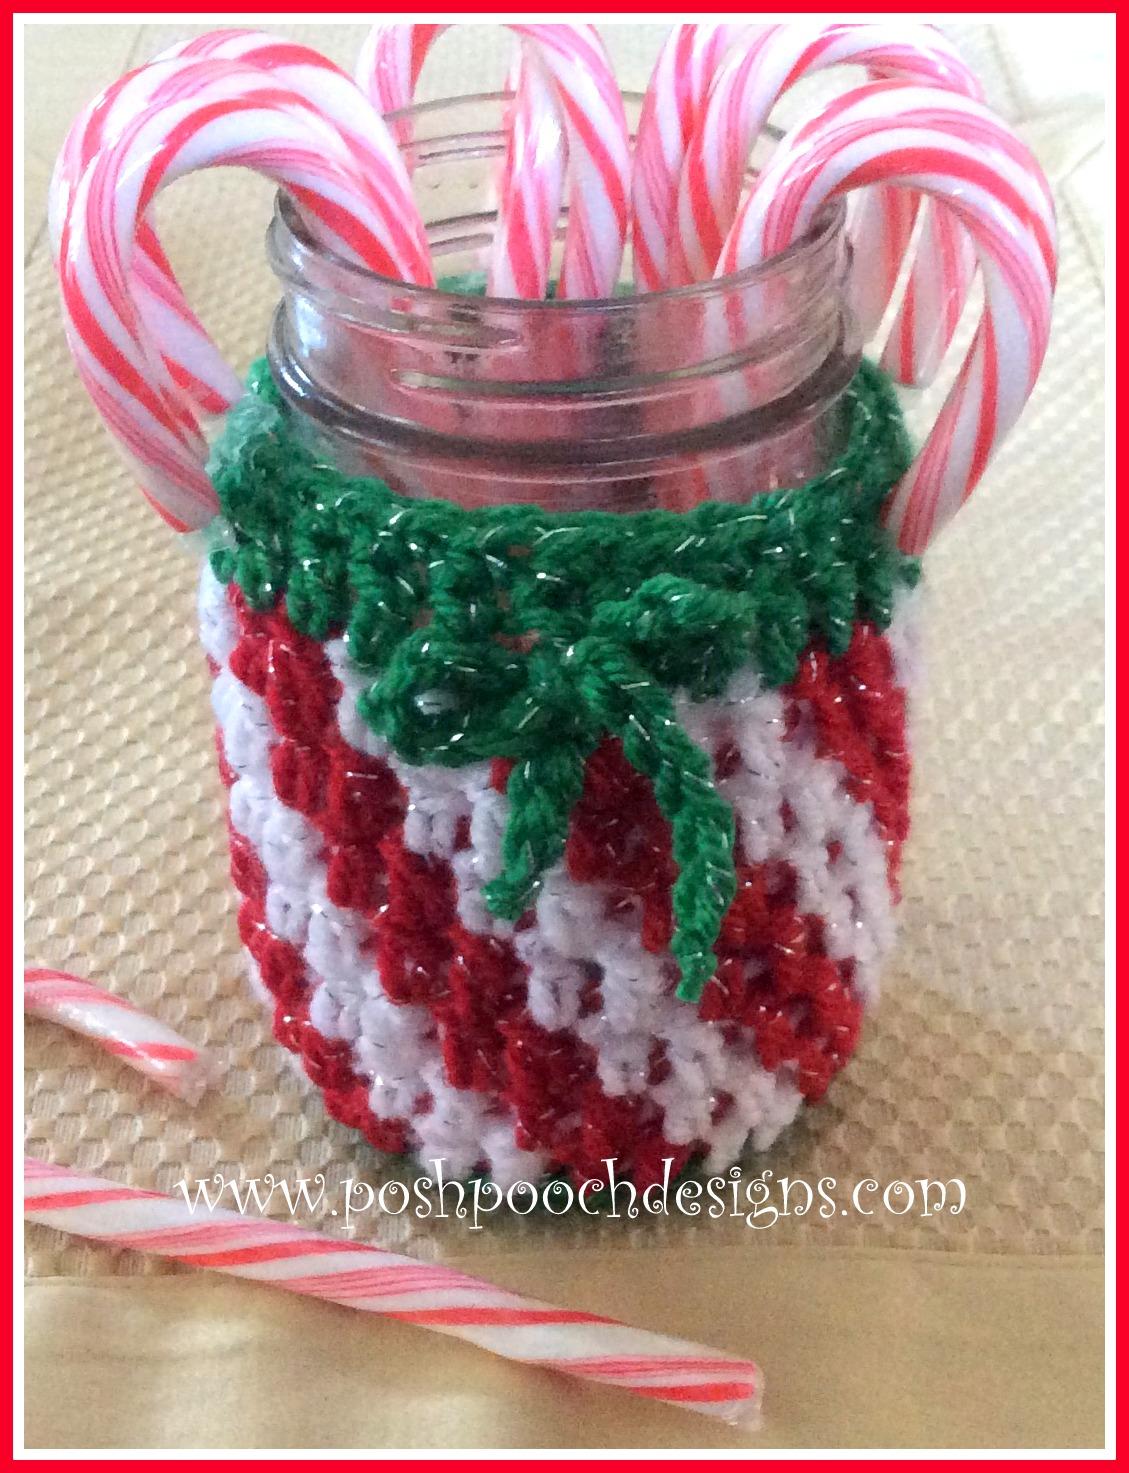 Posh Pooch Designs Dog Clothes Candy Cane Jar Cozie